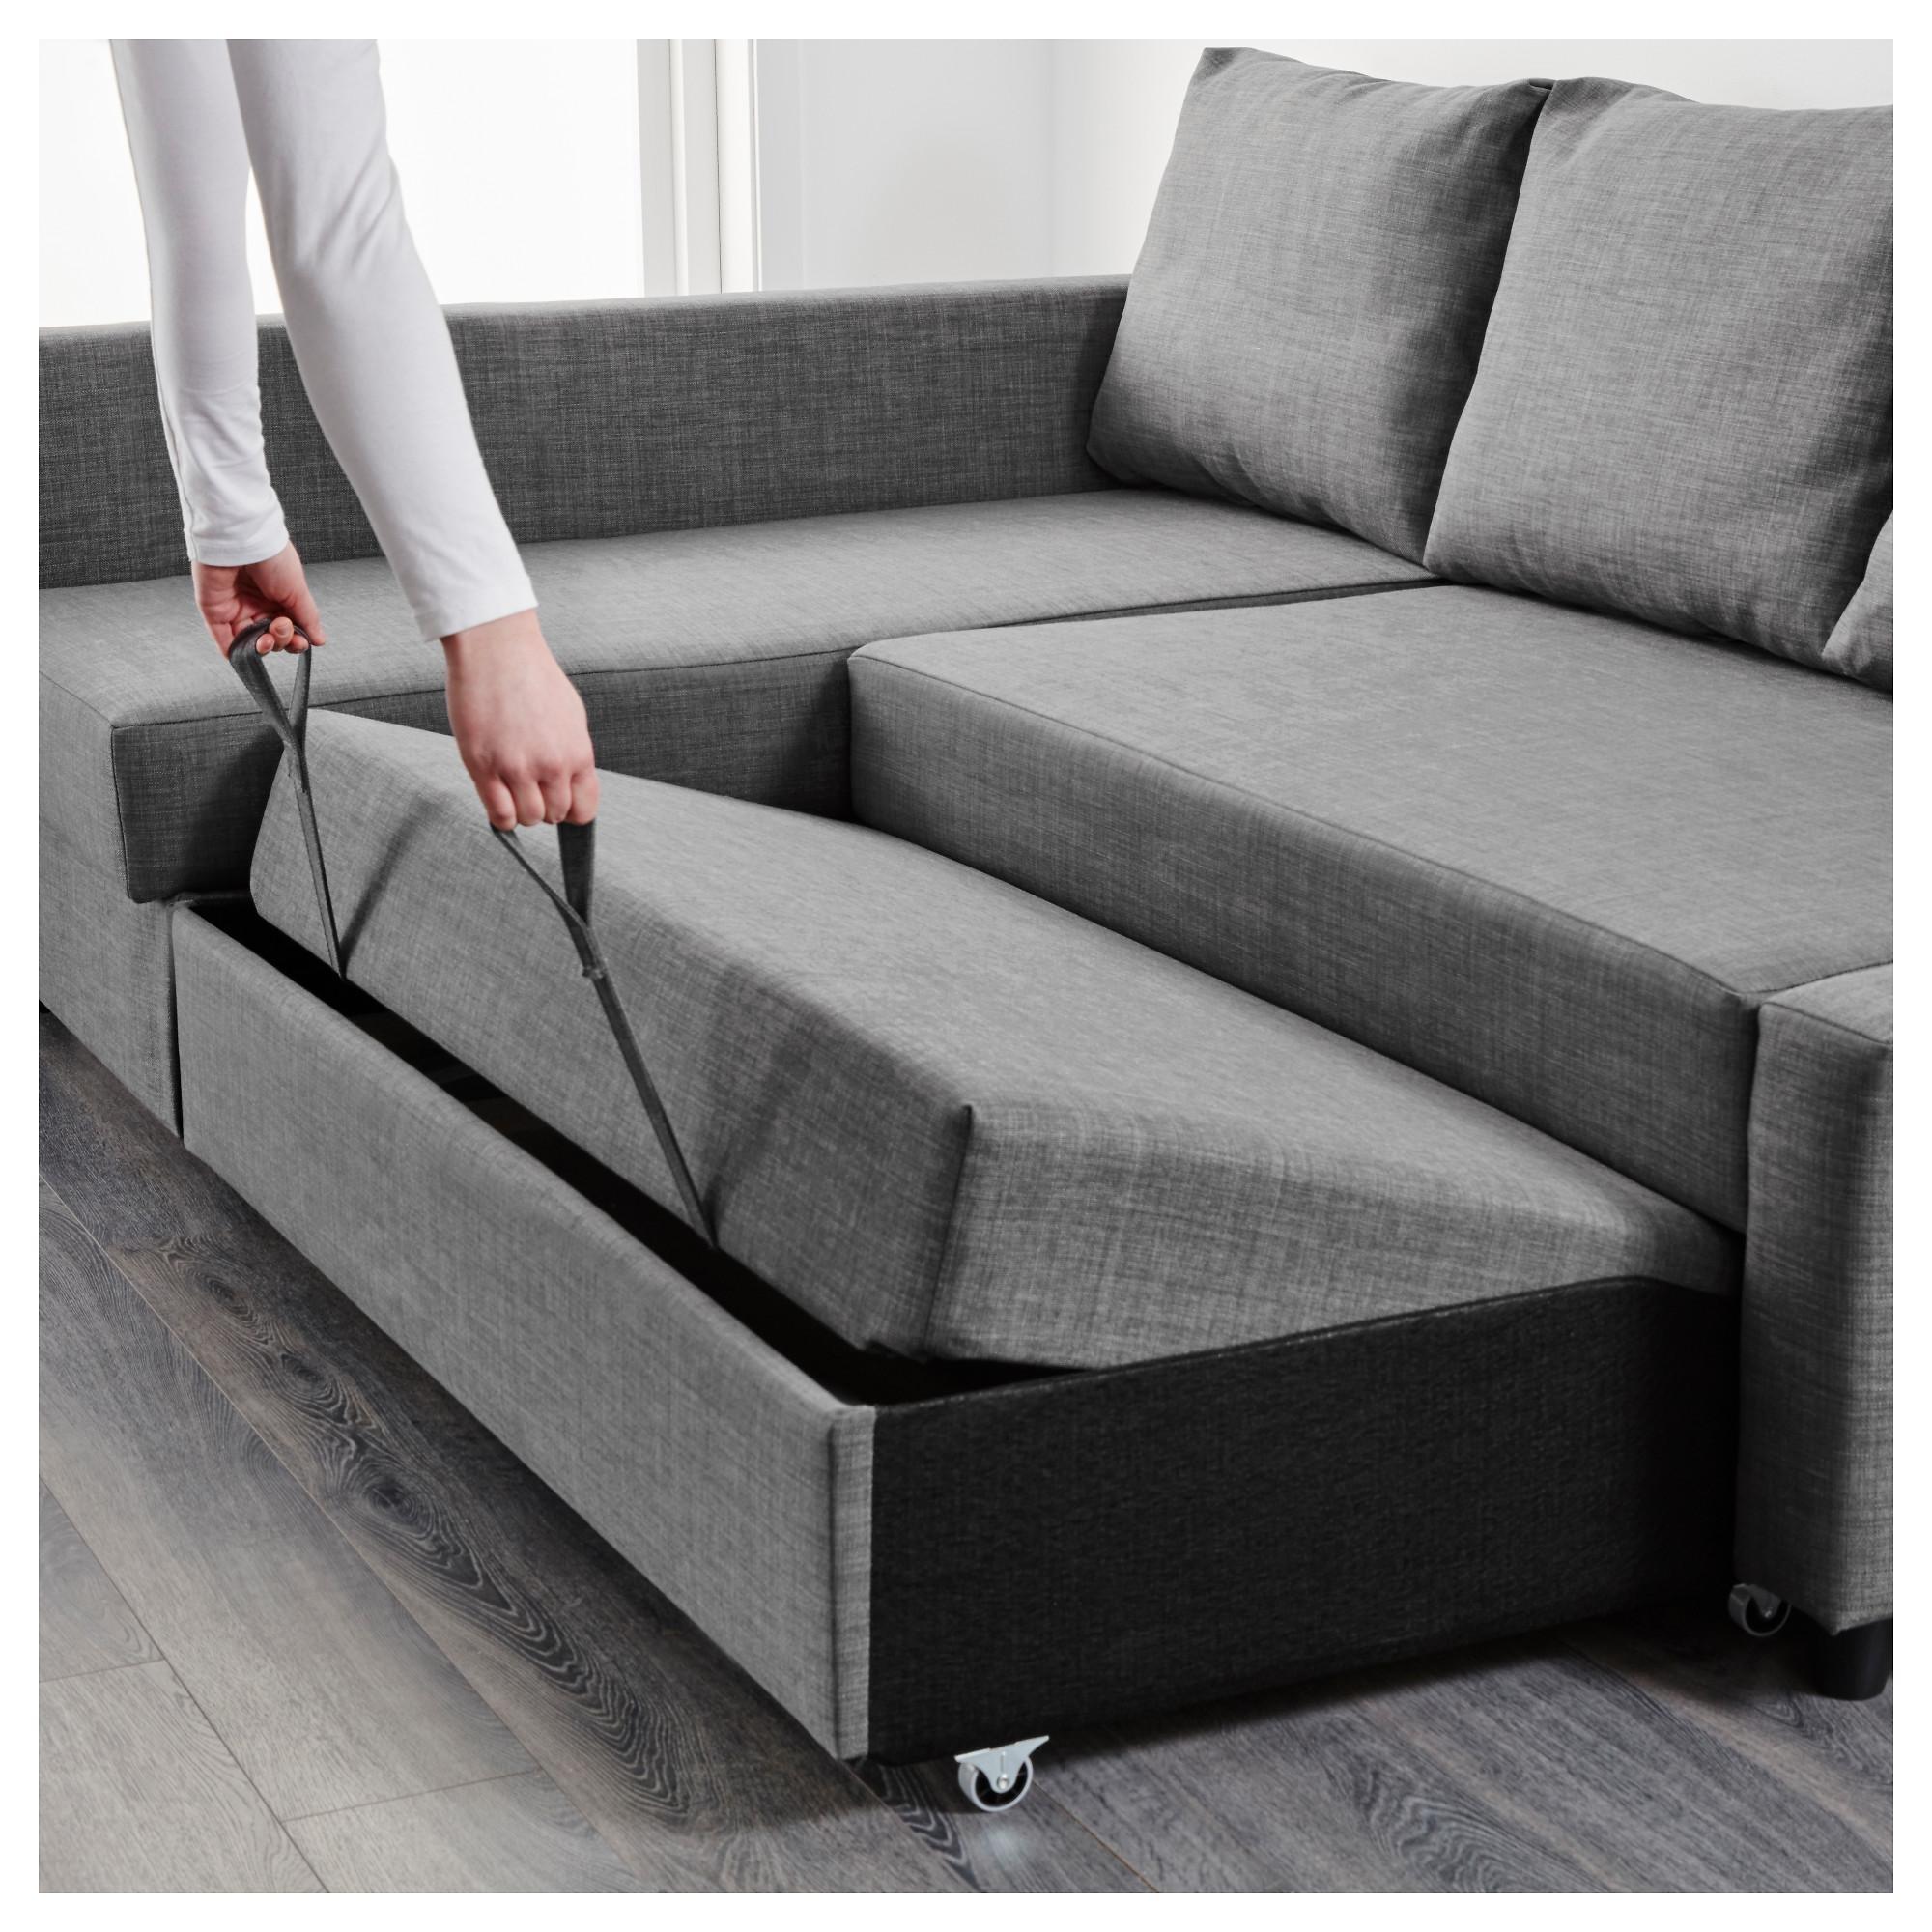 Friheten Corner Sofa Bed With Storage Skiftebo Dark Grey – Ikea Within Ikea Corner Sofa Bed With Storage (Image 10 of 20)